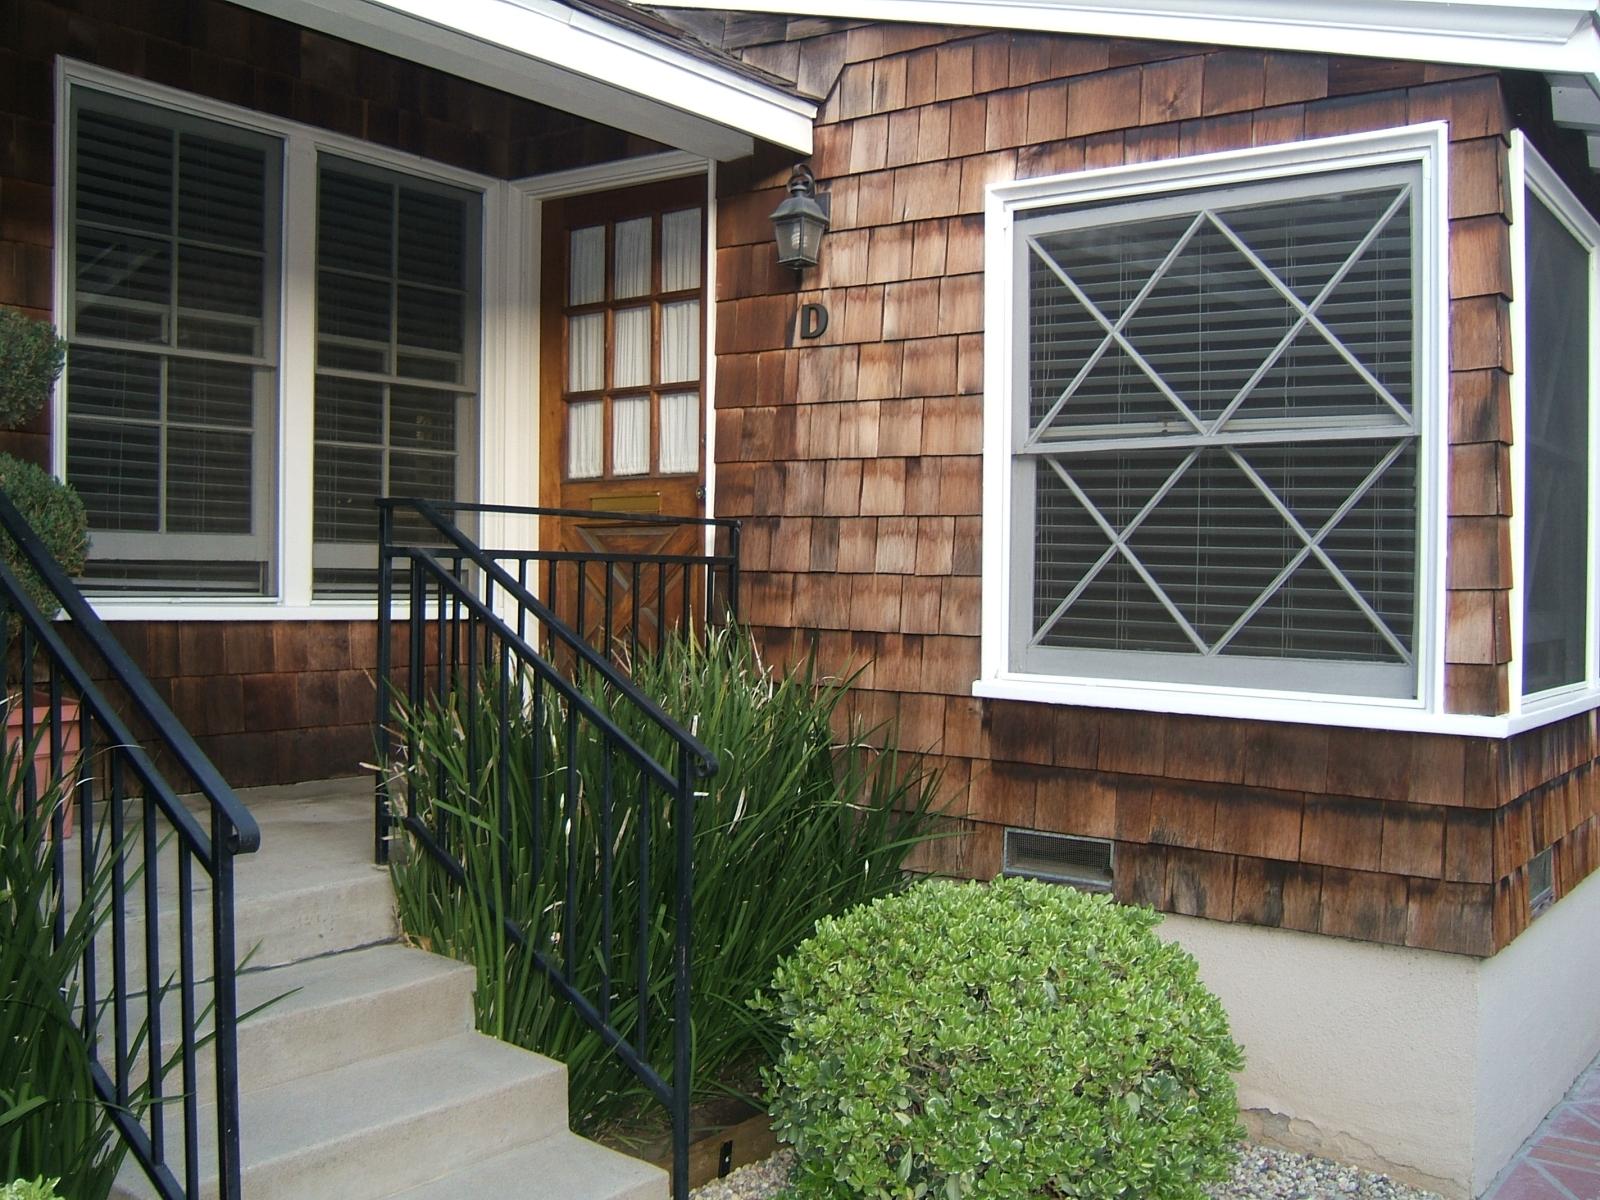 1 Bedroom for Rent - 2922 Arizona Ave Santa Monica